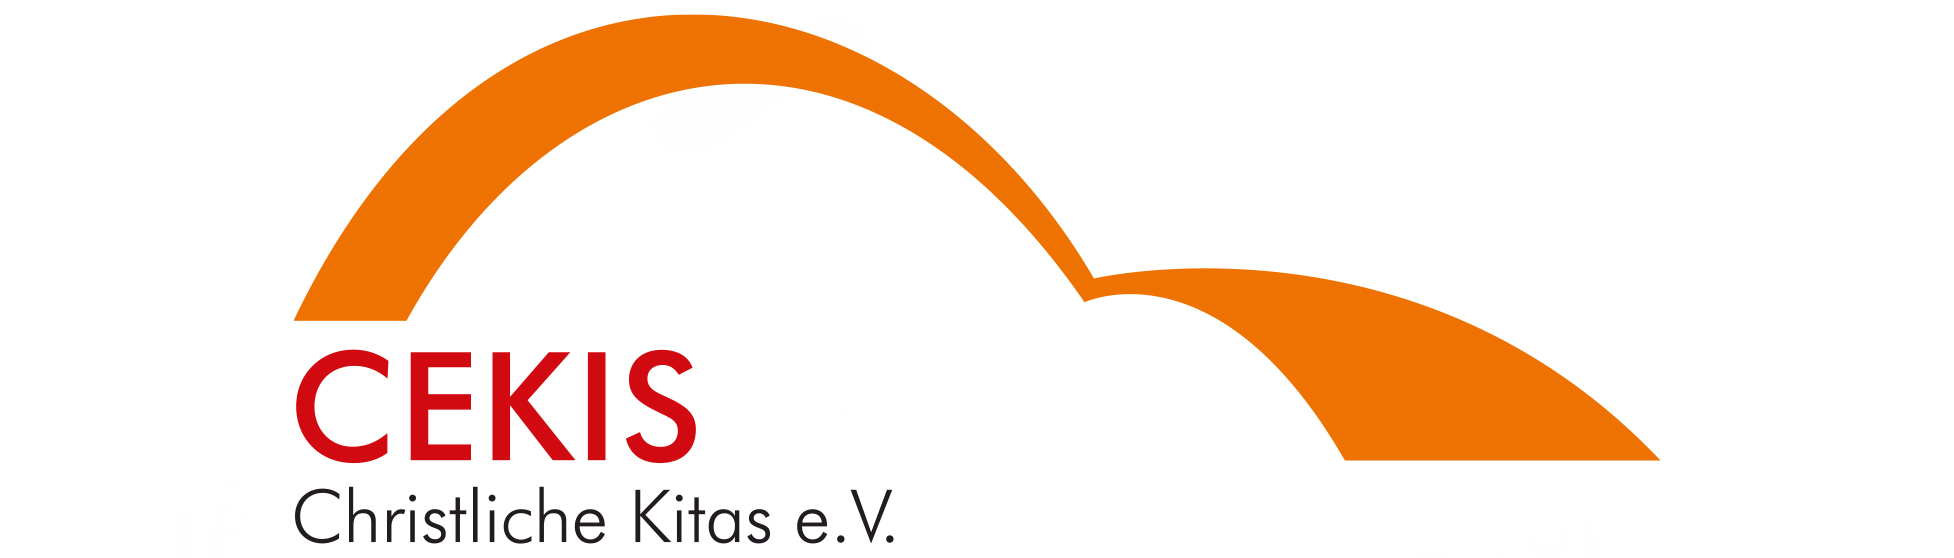 Logo CEKIS